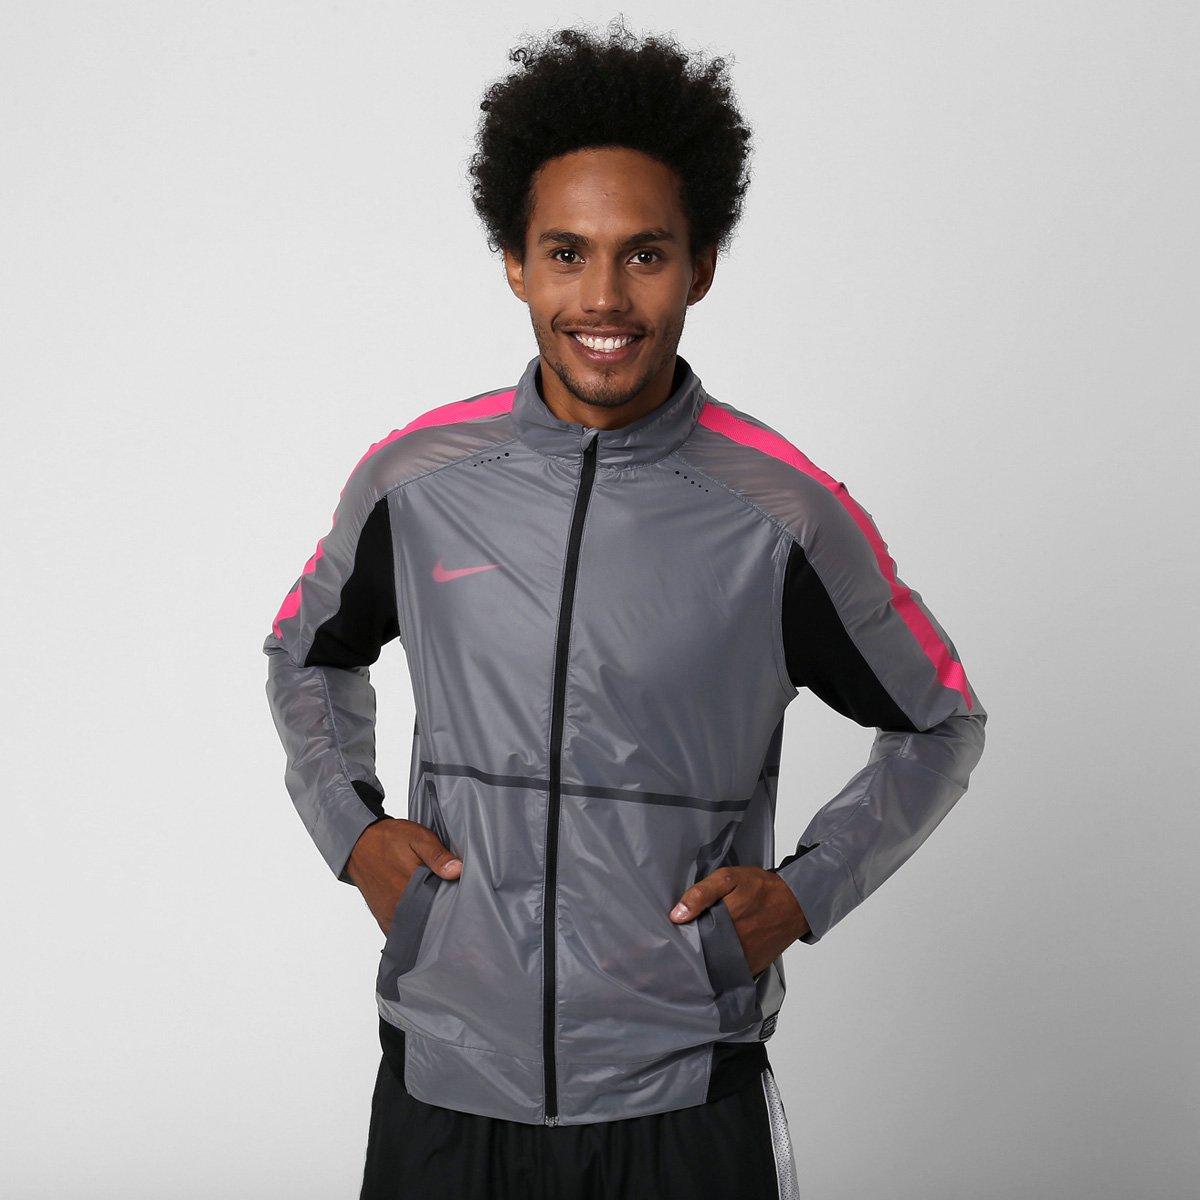 f3a2b3c624f Jaqueta Nike Select Revolution Lightweight Woven - Compre Agora ...